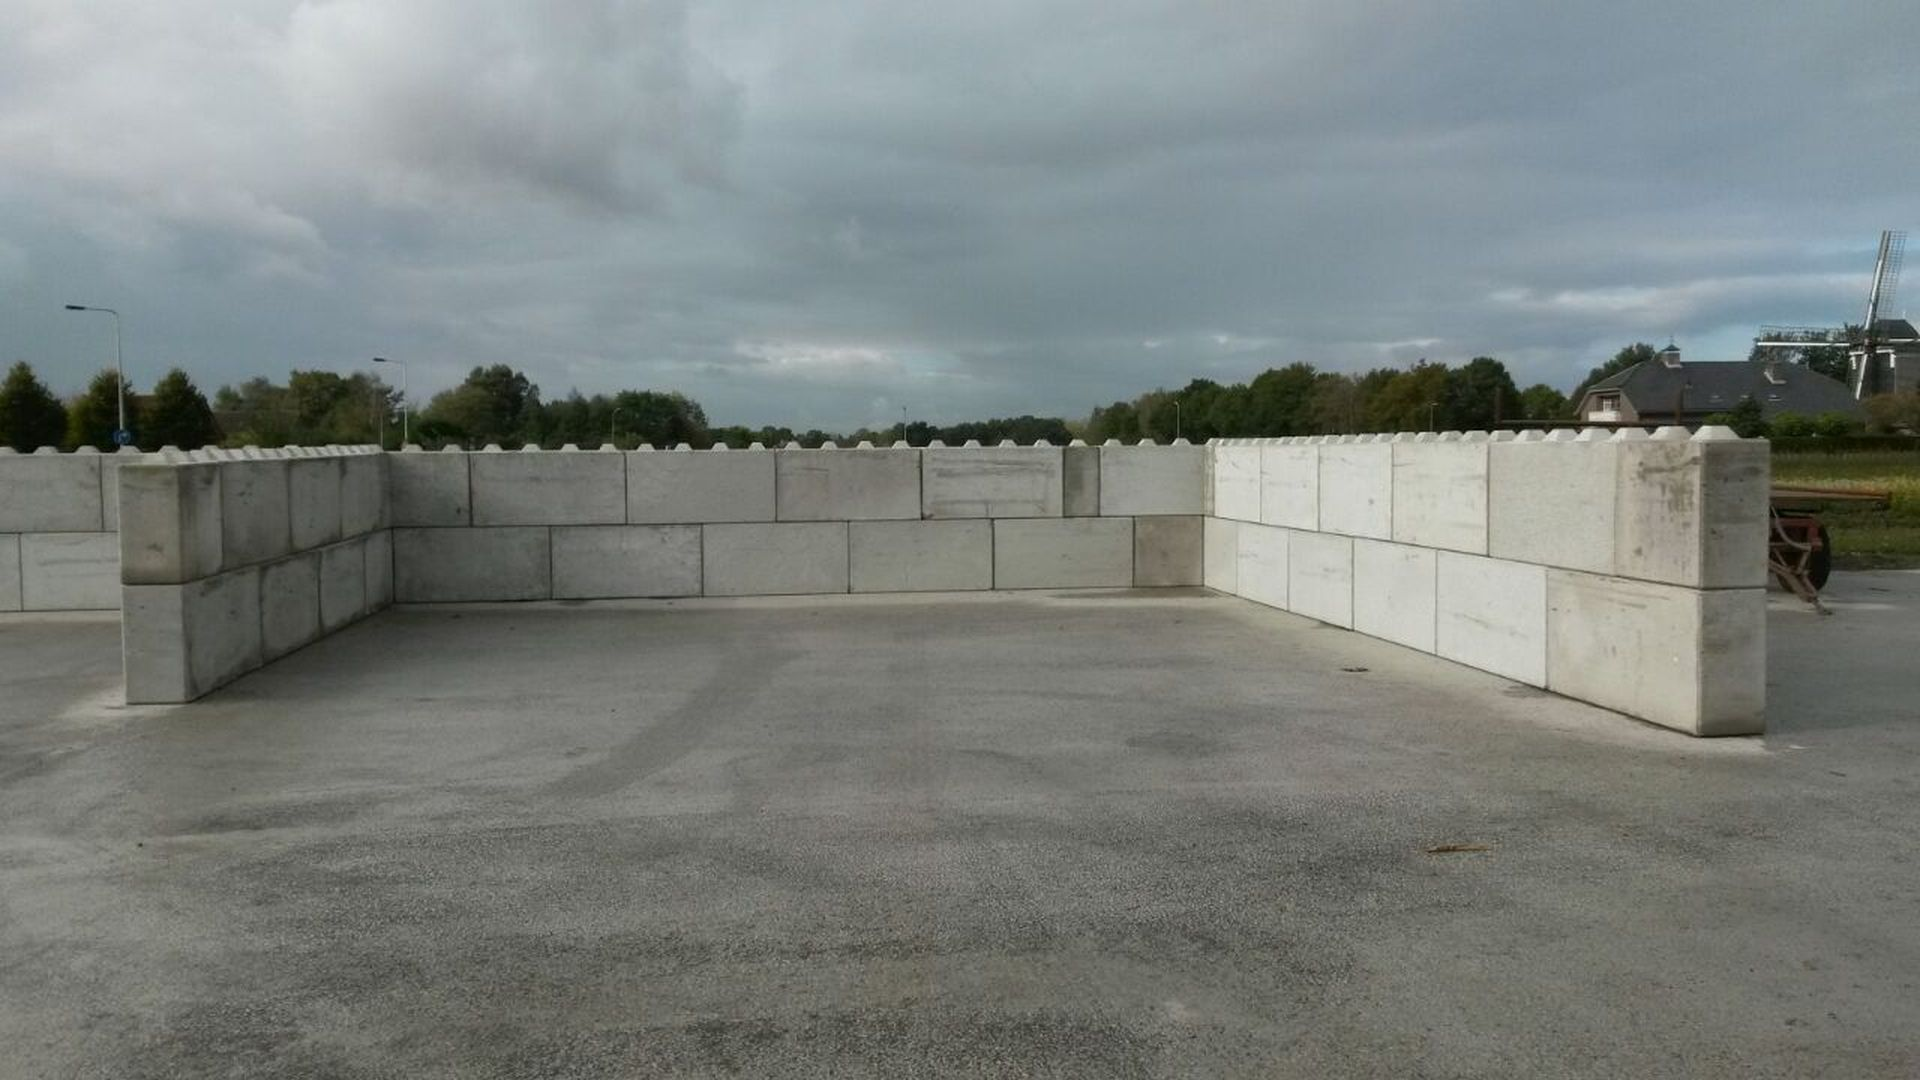 Megablokken plaatsen 160x40x80, 80x40x80 en 40x40x80 | Project Zundert